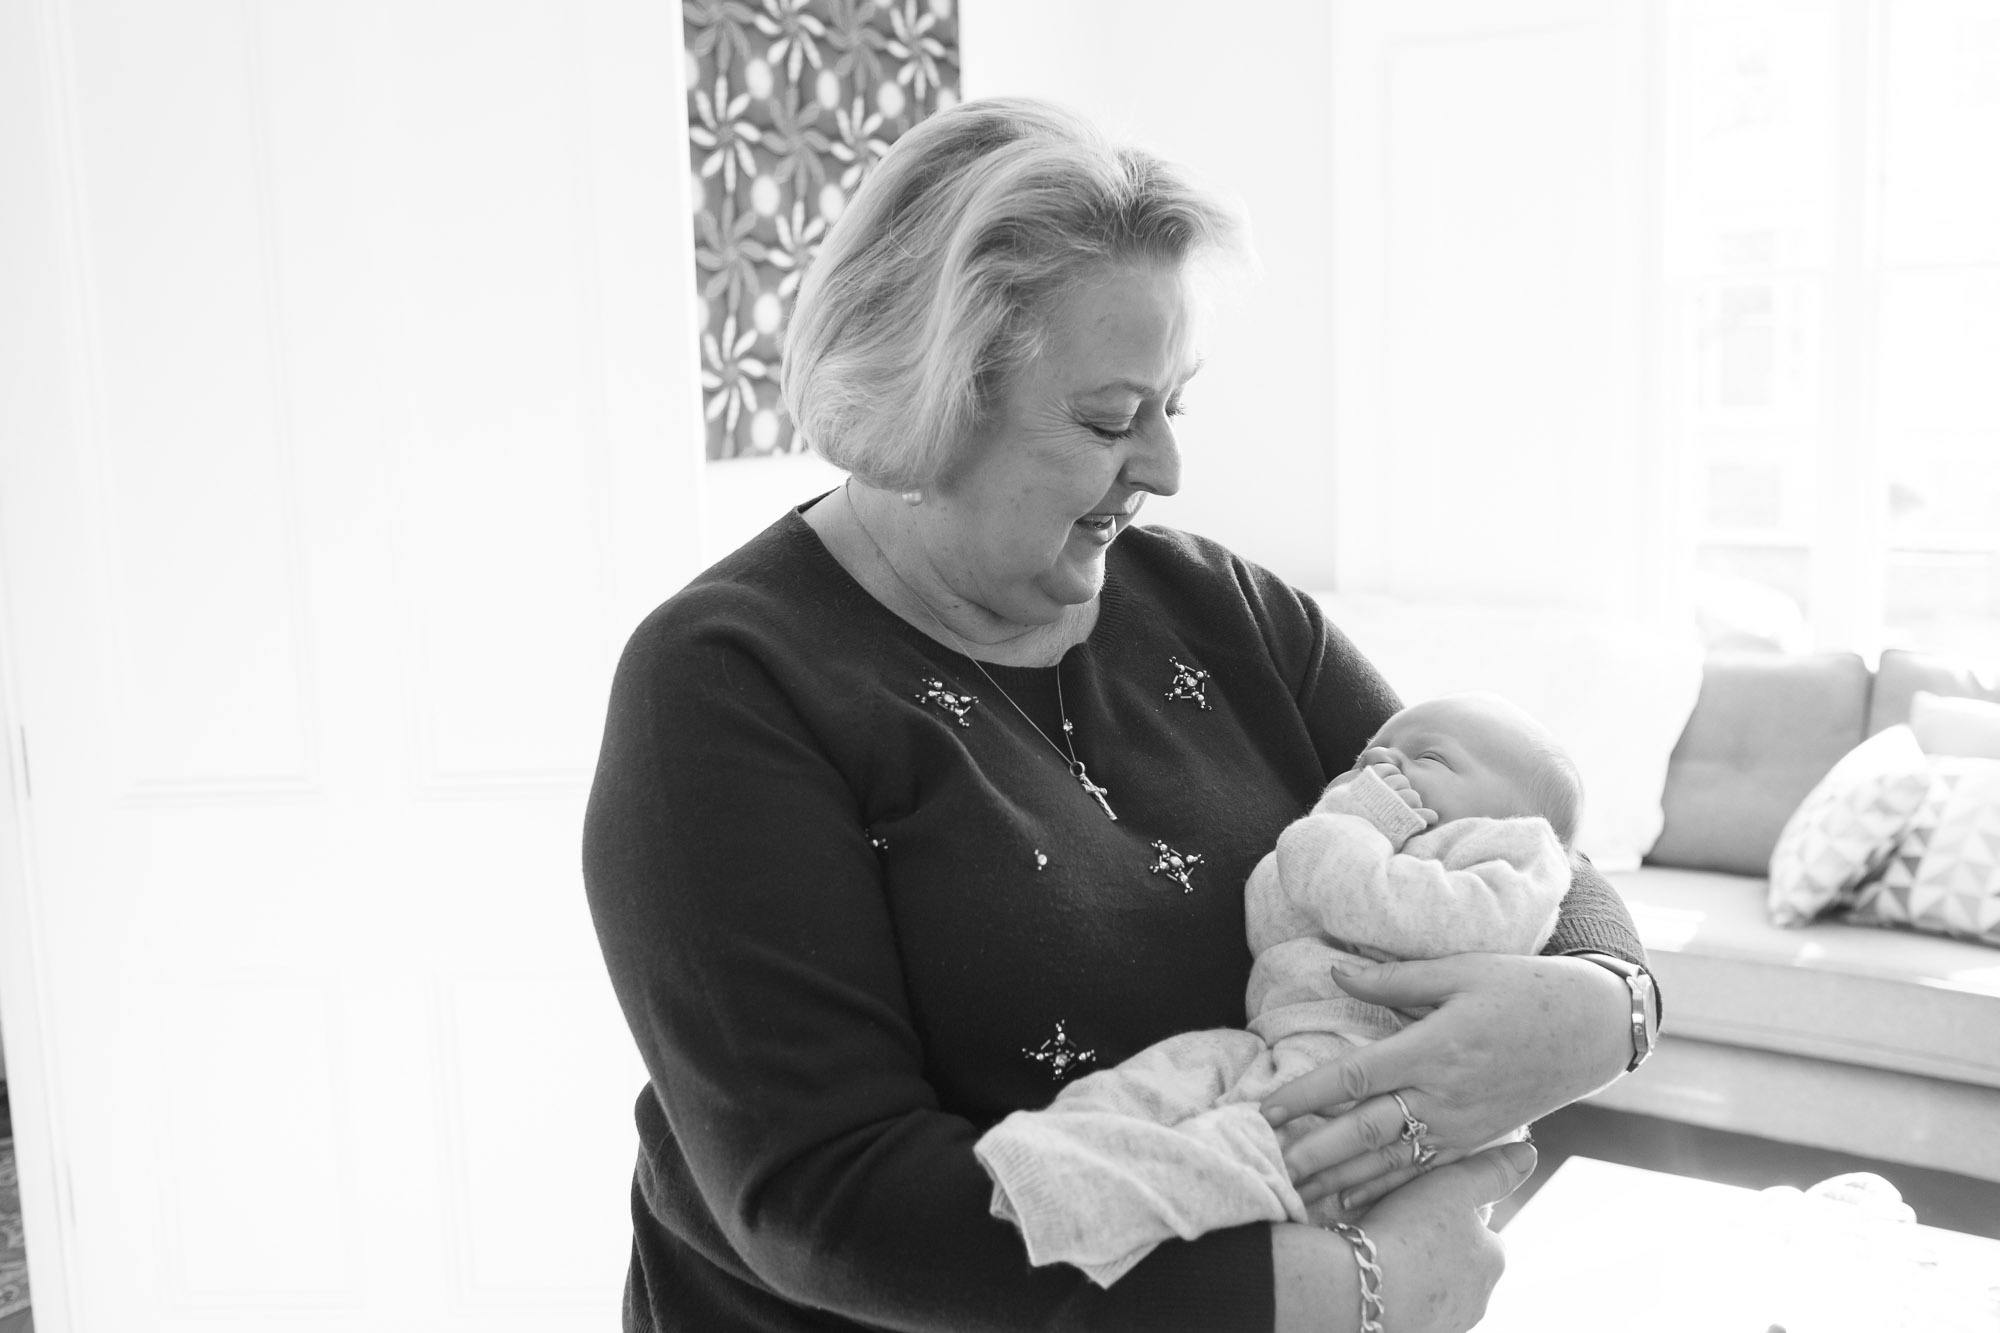 newborn-baby-family-portrait-photographer-092.jpg